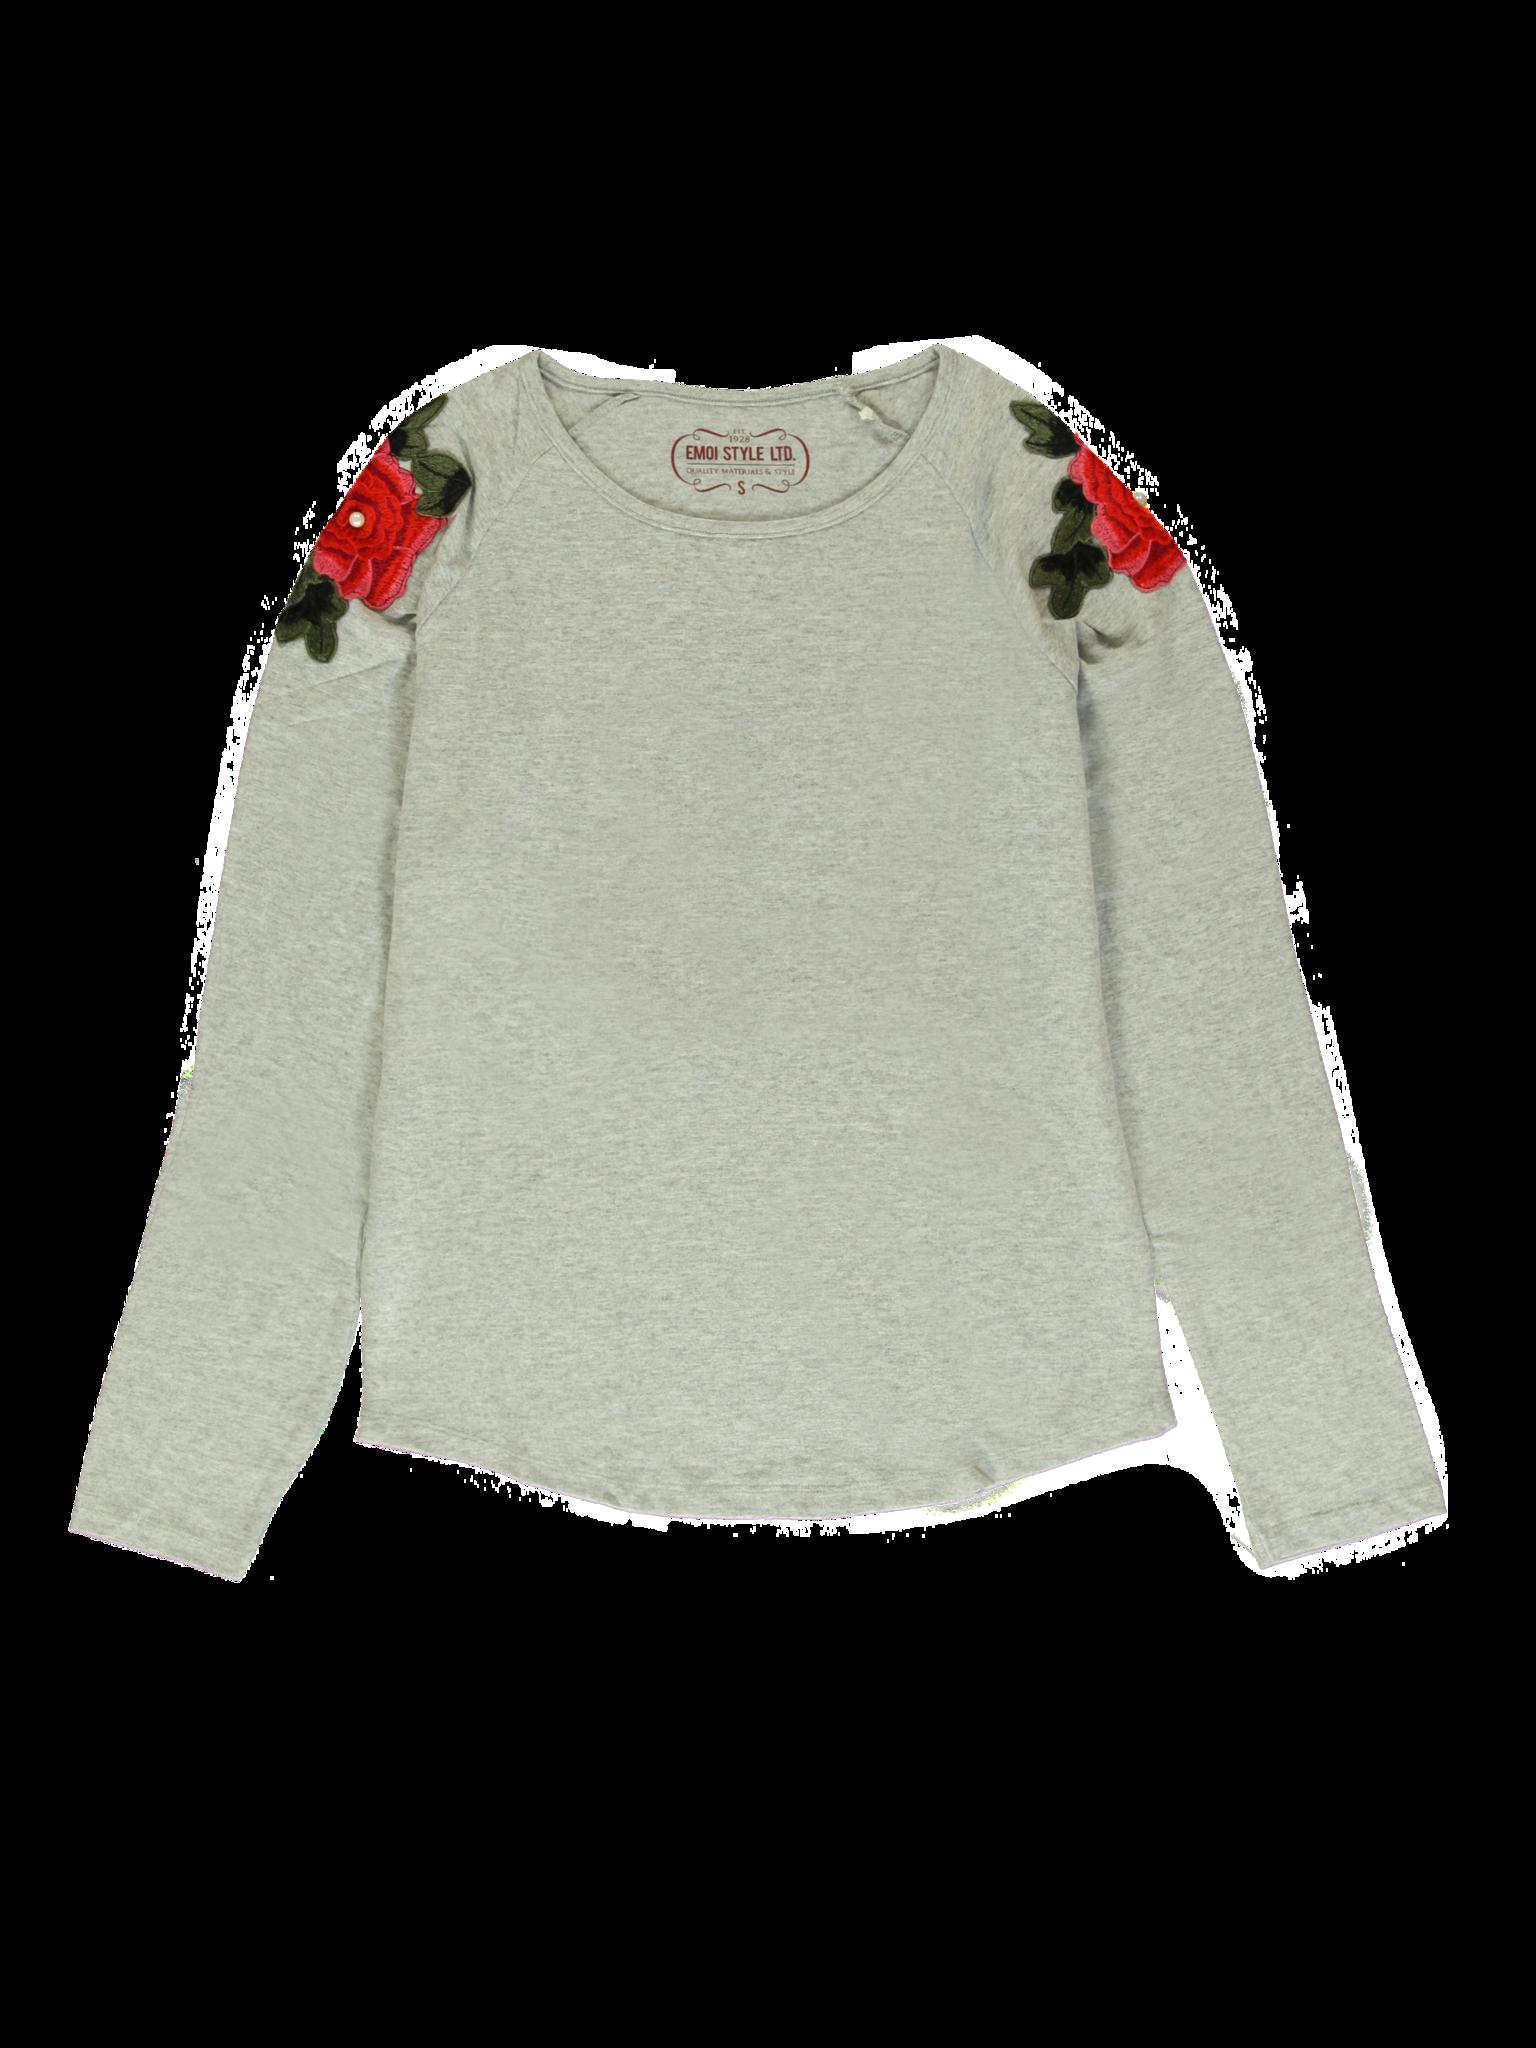 All Brands   Winterproducts Ladies   T-shirt   24 pcs/box